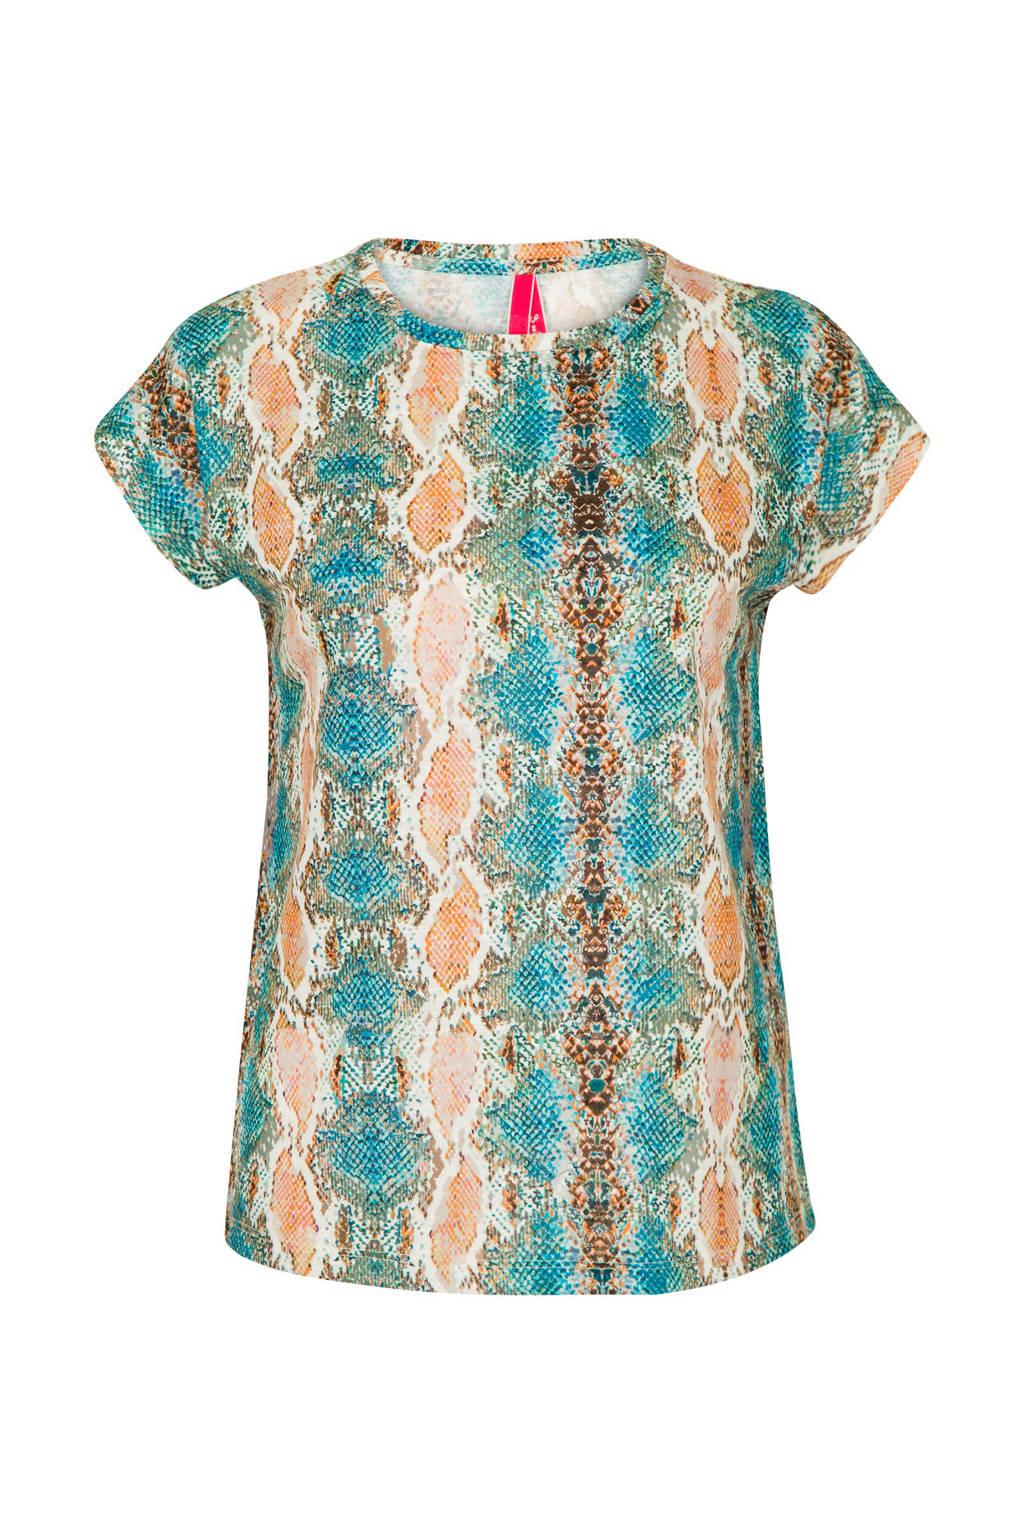 Miss Etam Regulier T-shirt met slangenprint blauw, Blauw